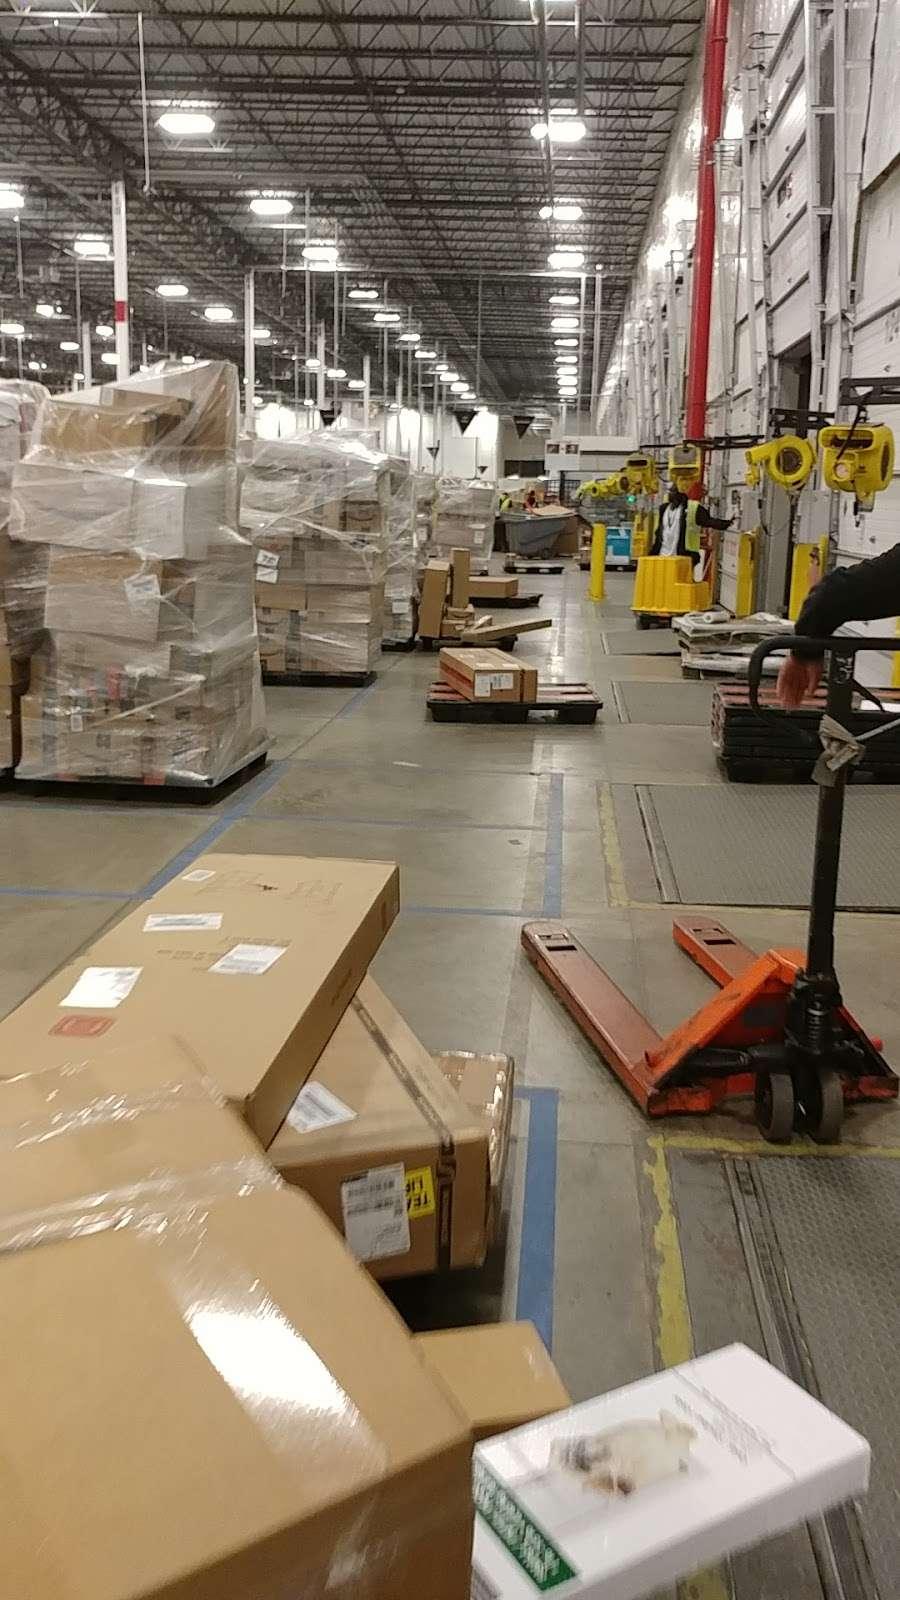 Amazon BWI5 - store  | Photo 3 of 10 | Address: 5501 Holabird Ave, Baltimore, MD 21224, USA | Phone: (866) 423-5350